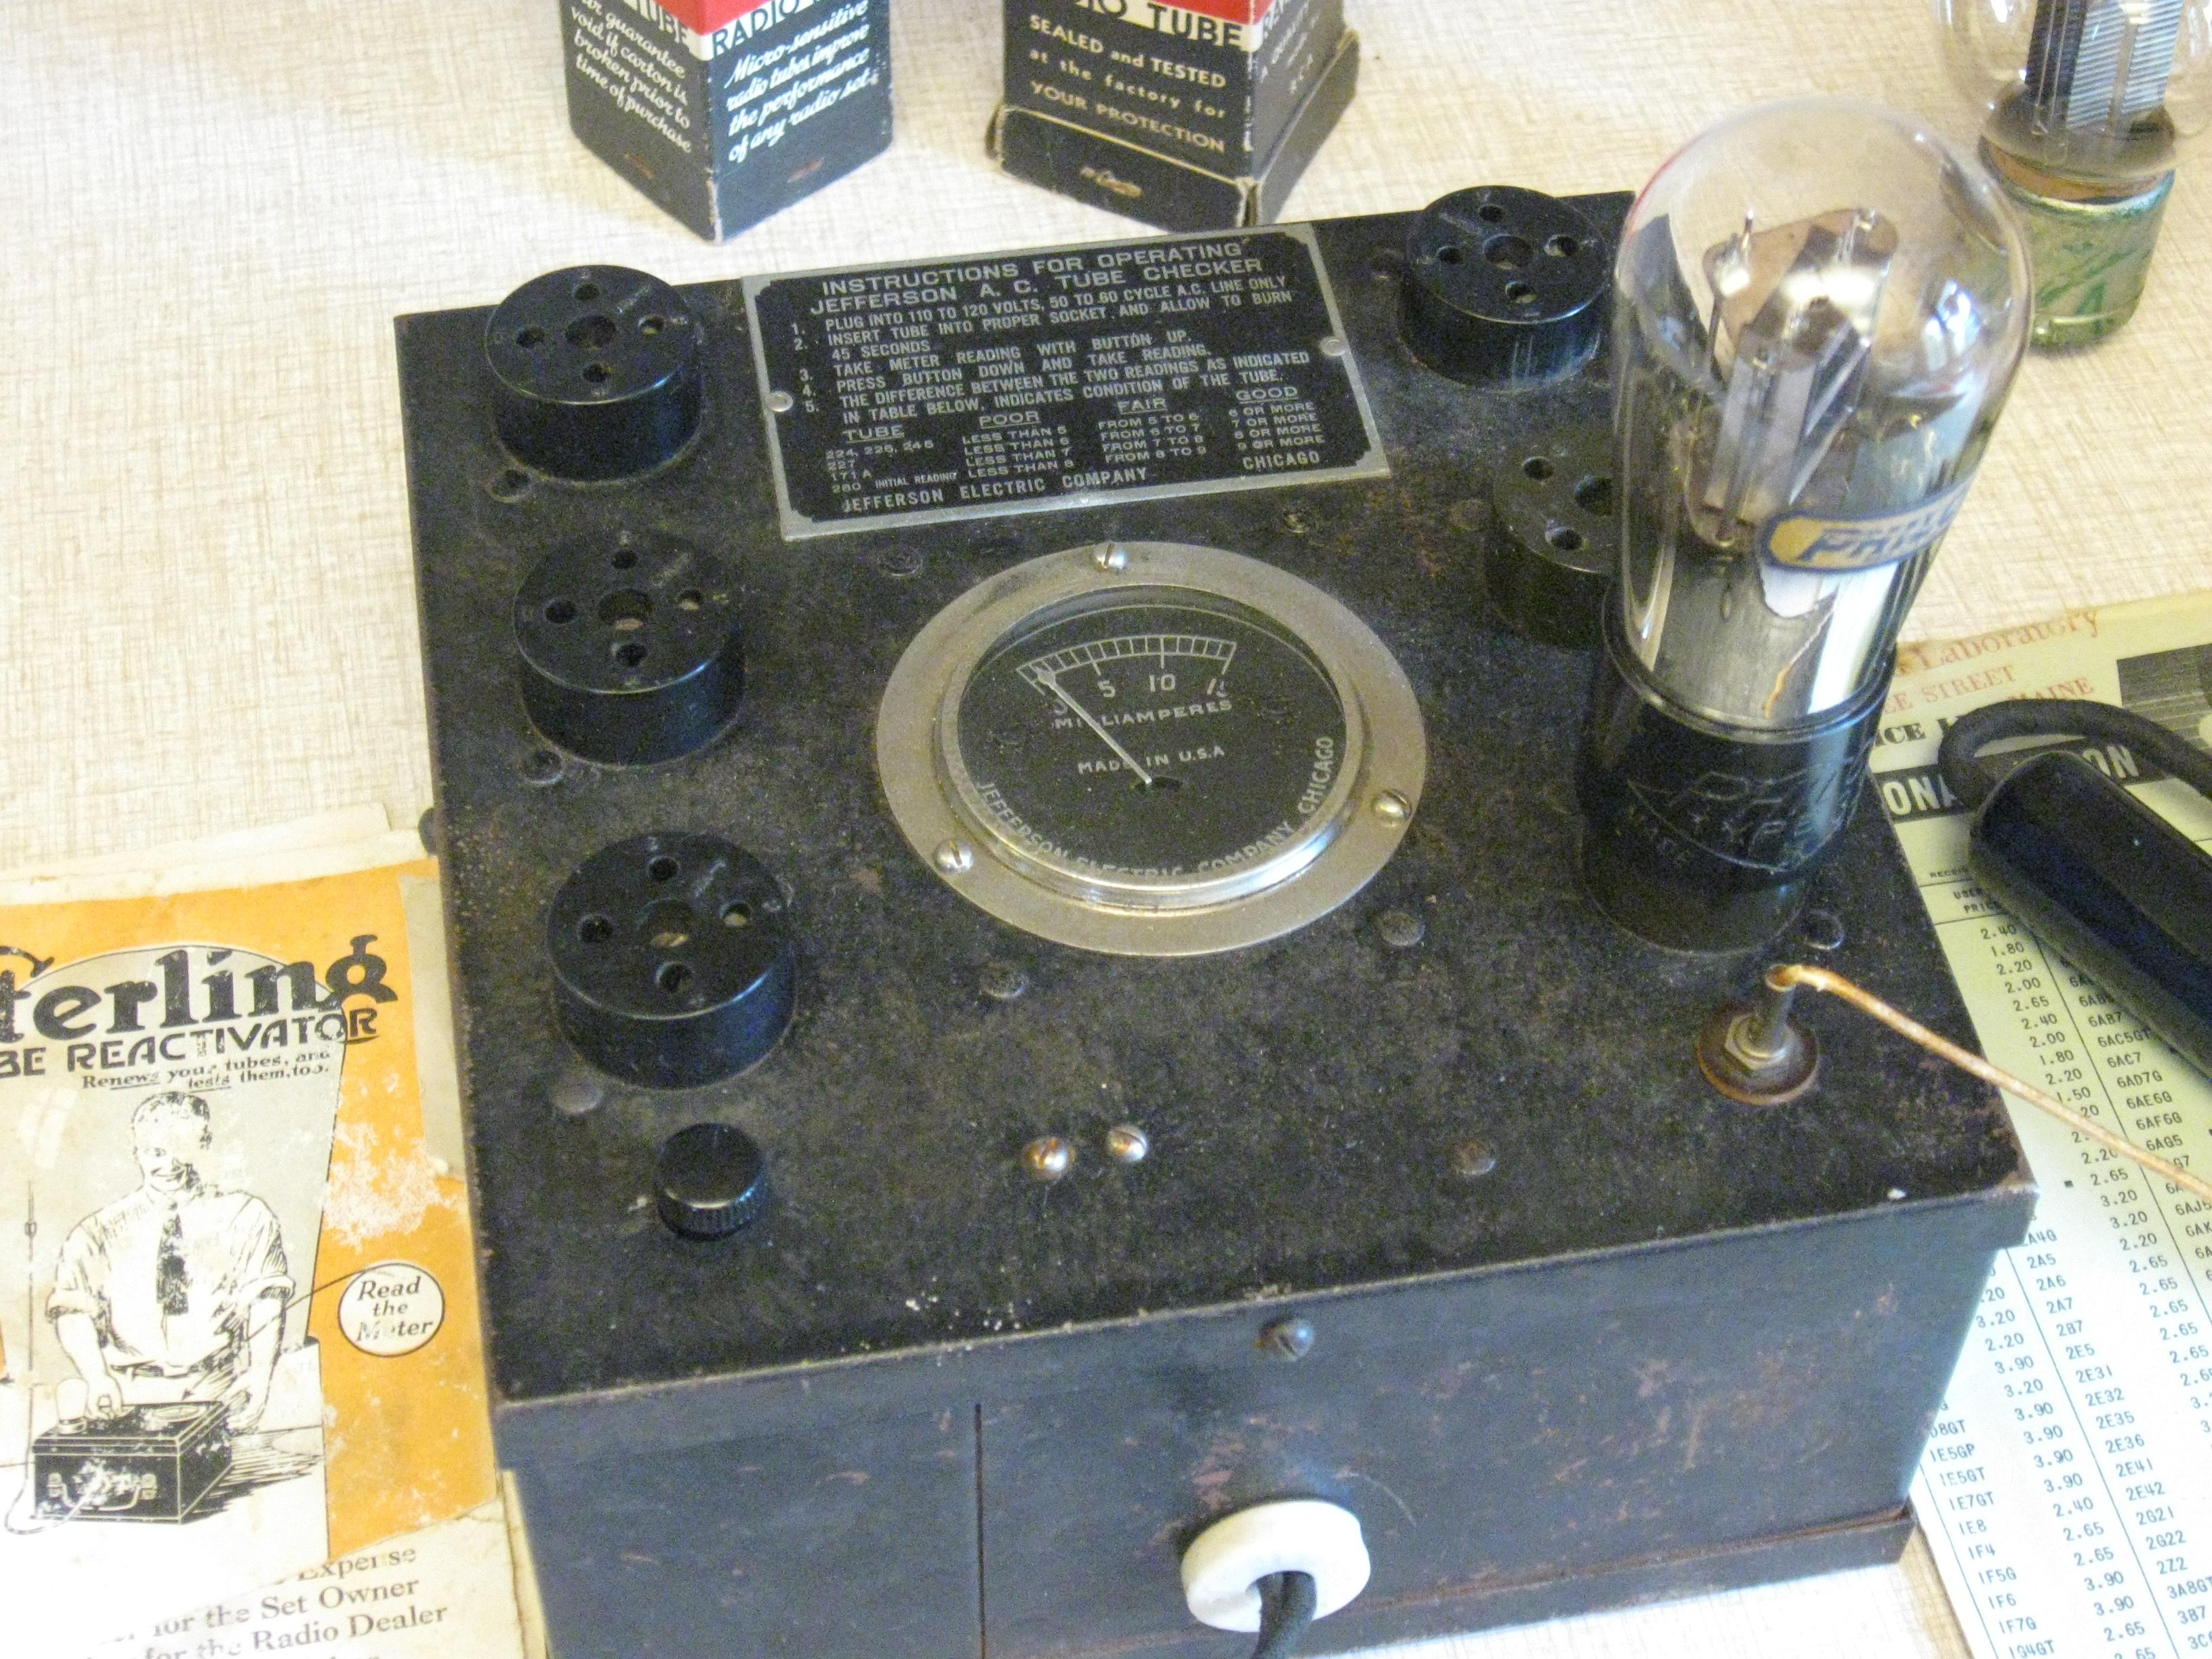 Jefferson AC tube checker